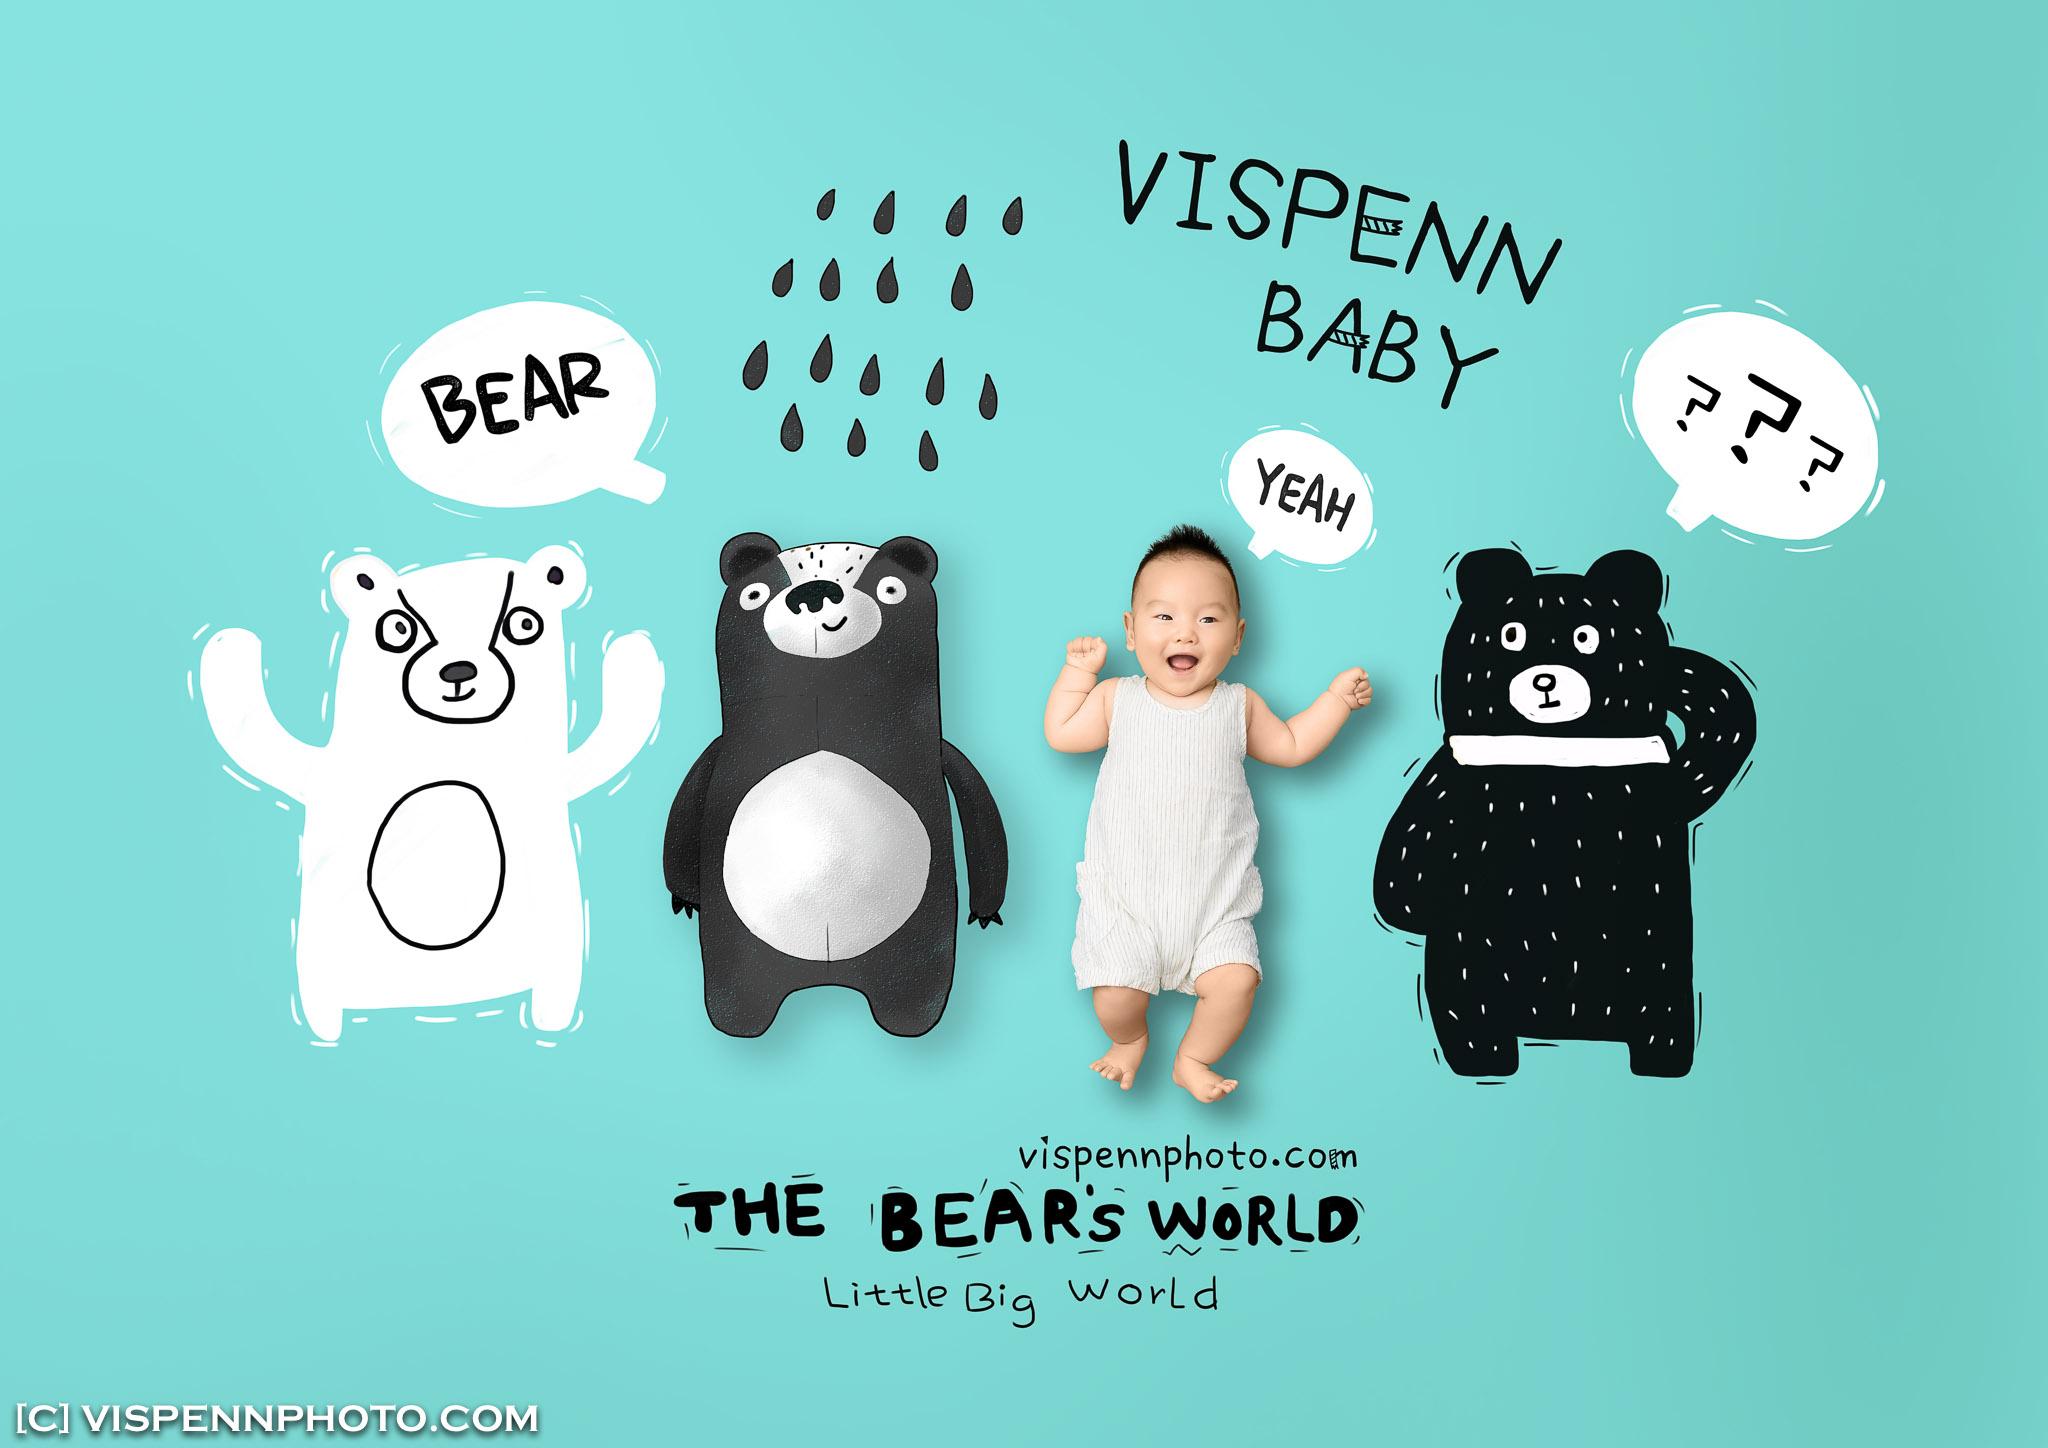 Melbourne Newborn Baby Family Photo BaoBao VISPENN 墨尔本 儿童 宝宝 百天照 满月照 孕妇照 全家福 100DAYS LiLing 1365 VISPENN